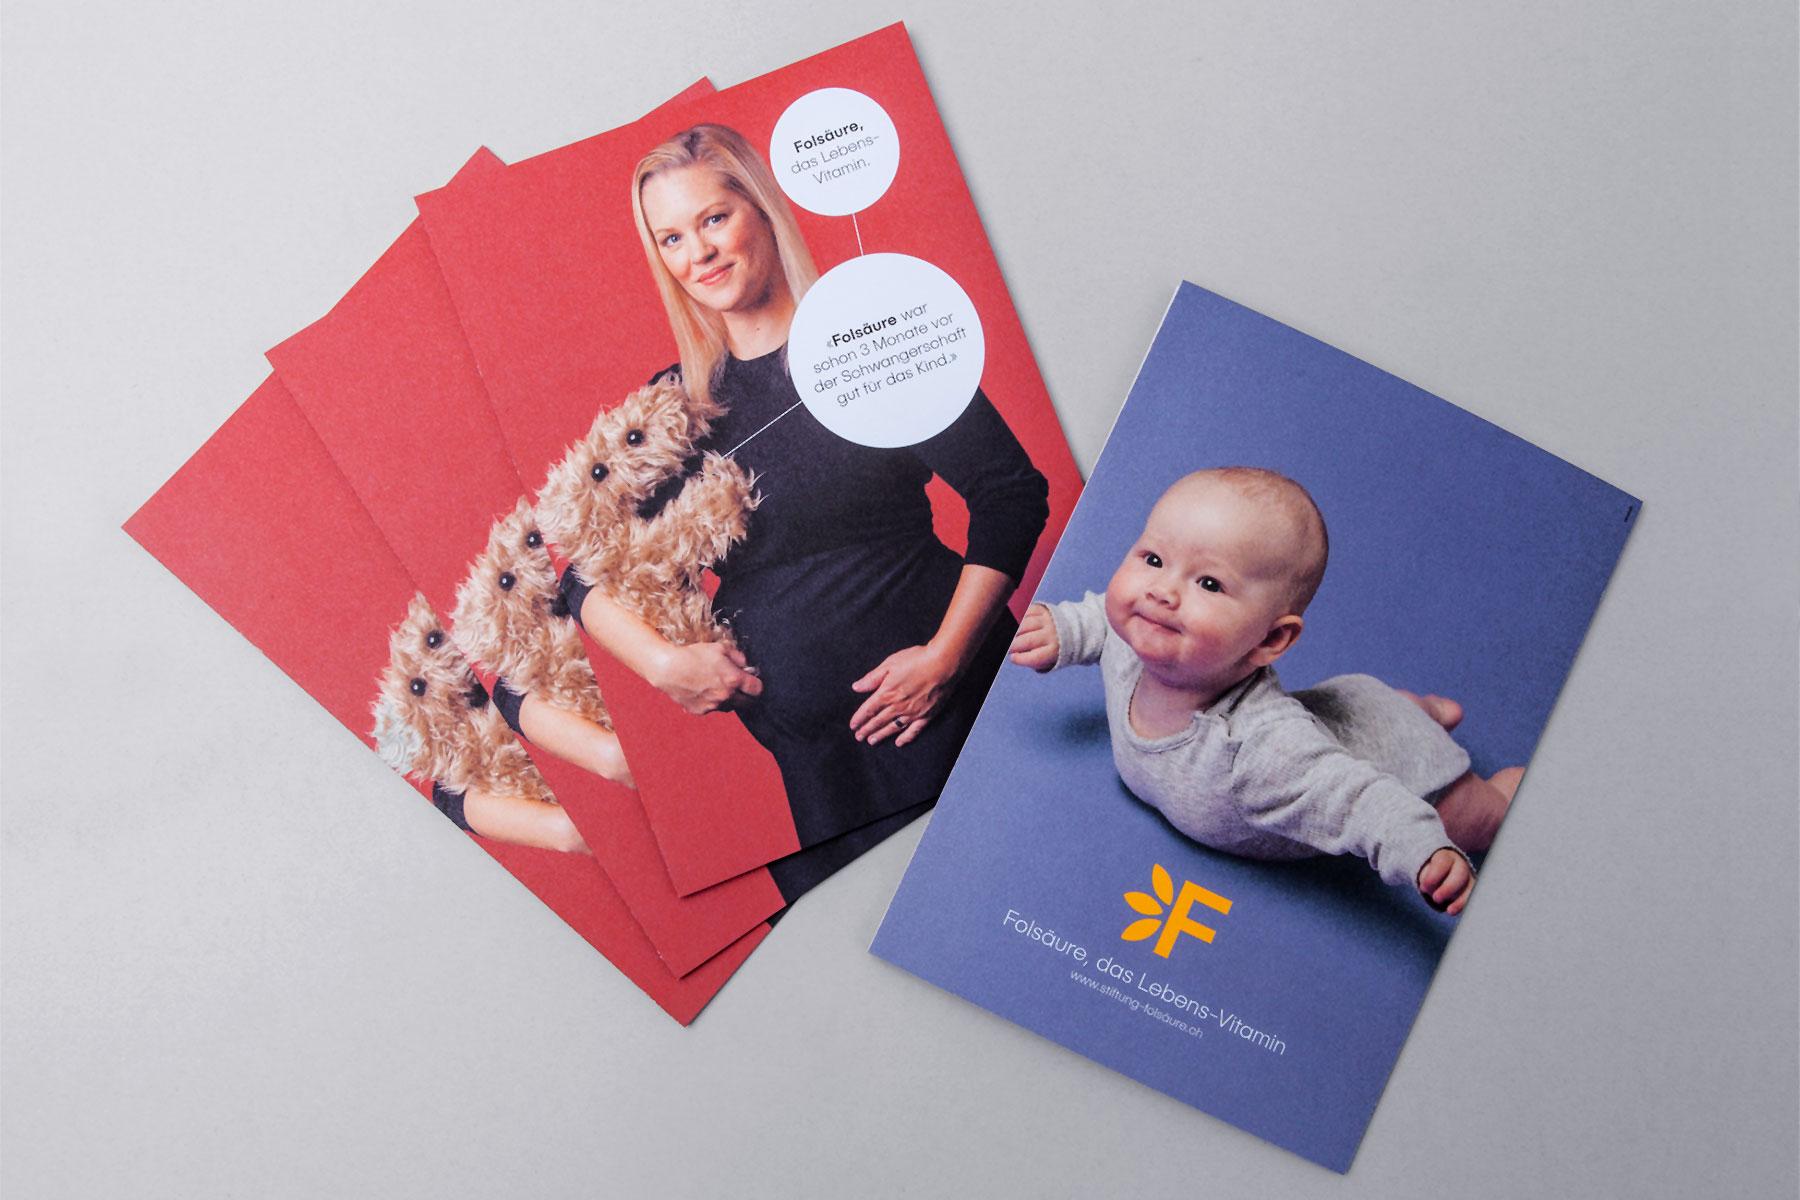 Stiftung Folsäure Leporello Corporate Design